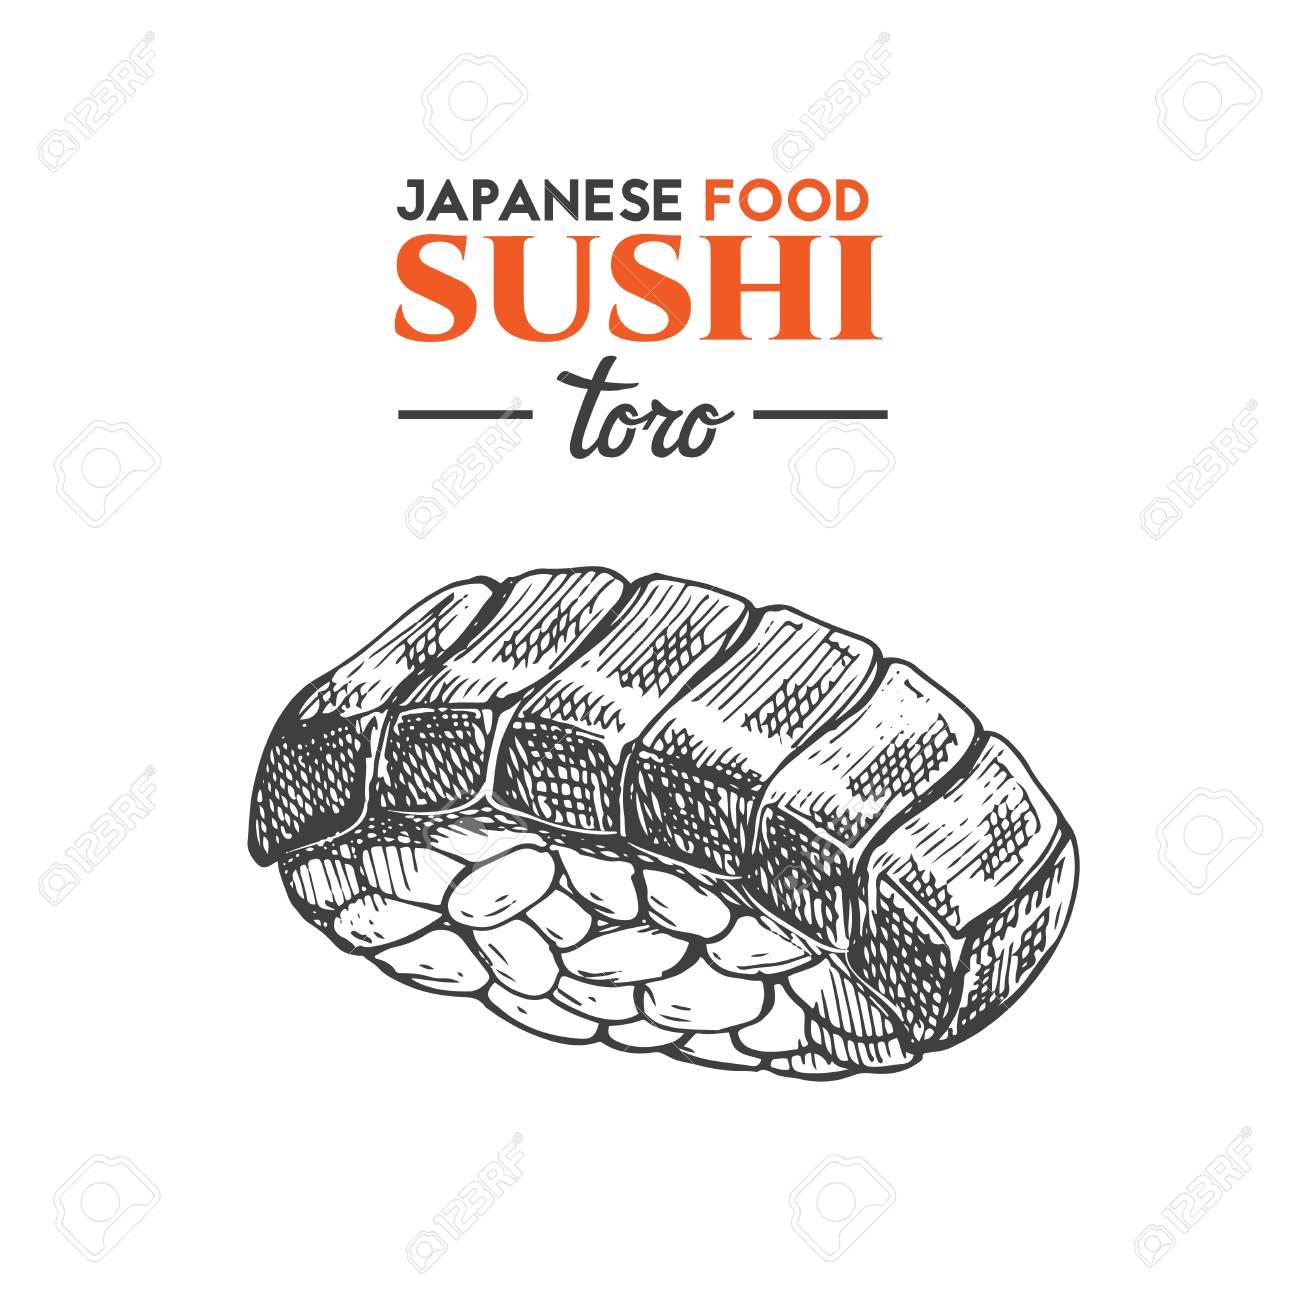 A Toro Sushi Icon Isolated On Plain Background Royalty 1299x1300